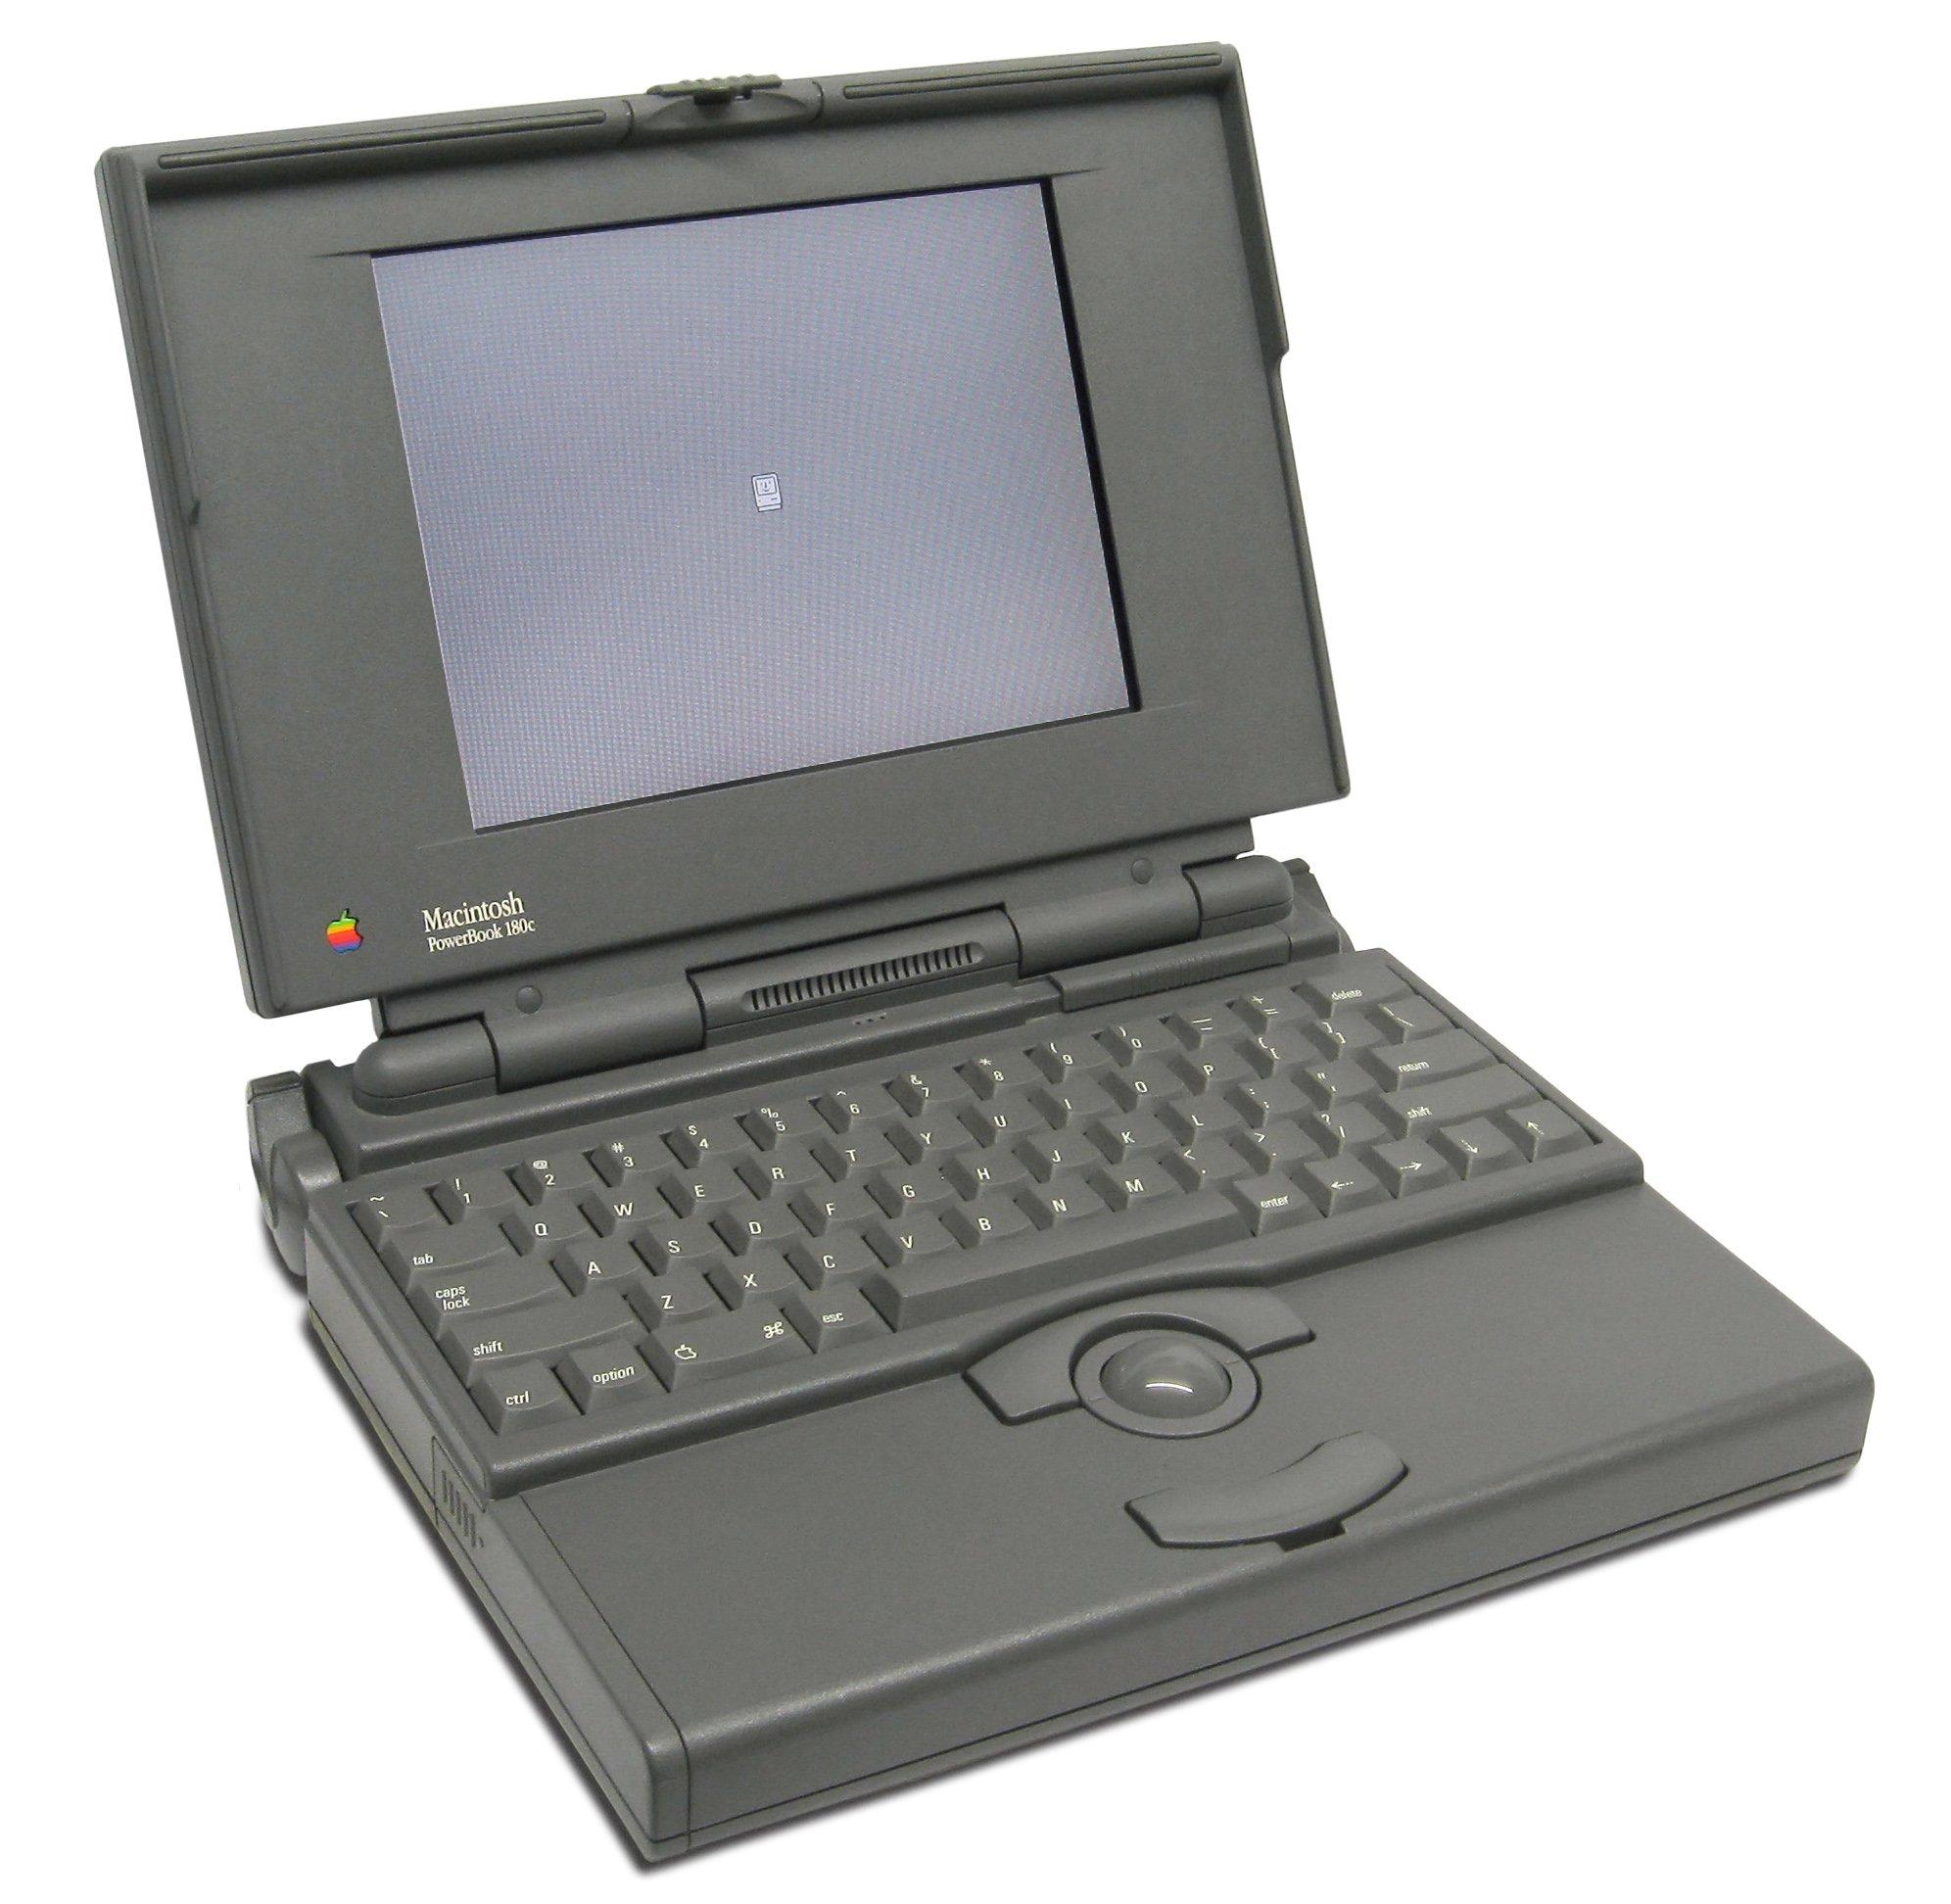 (1993) PowerBook 180c